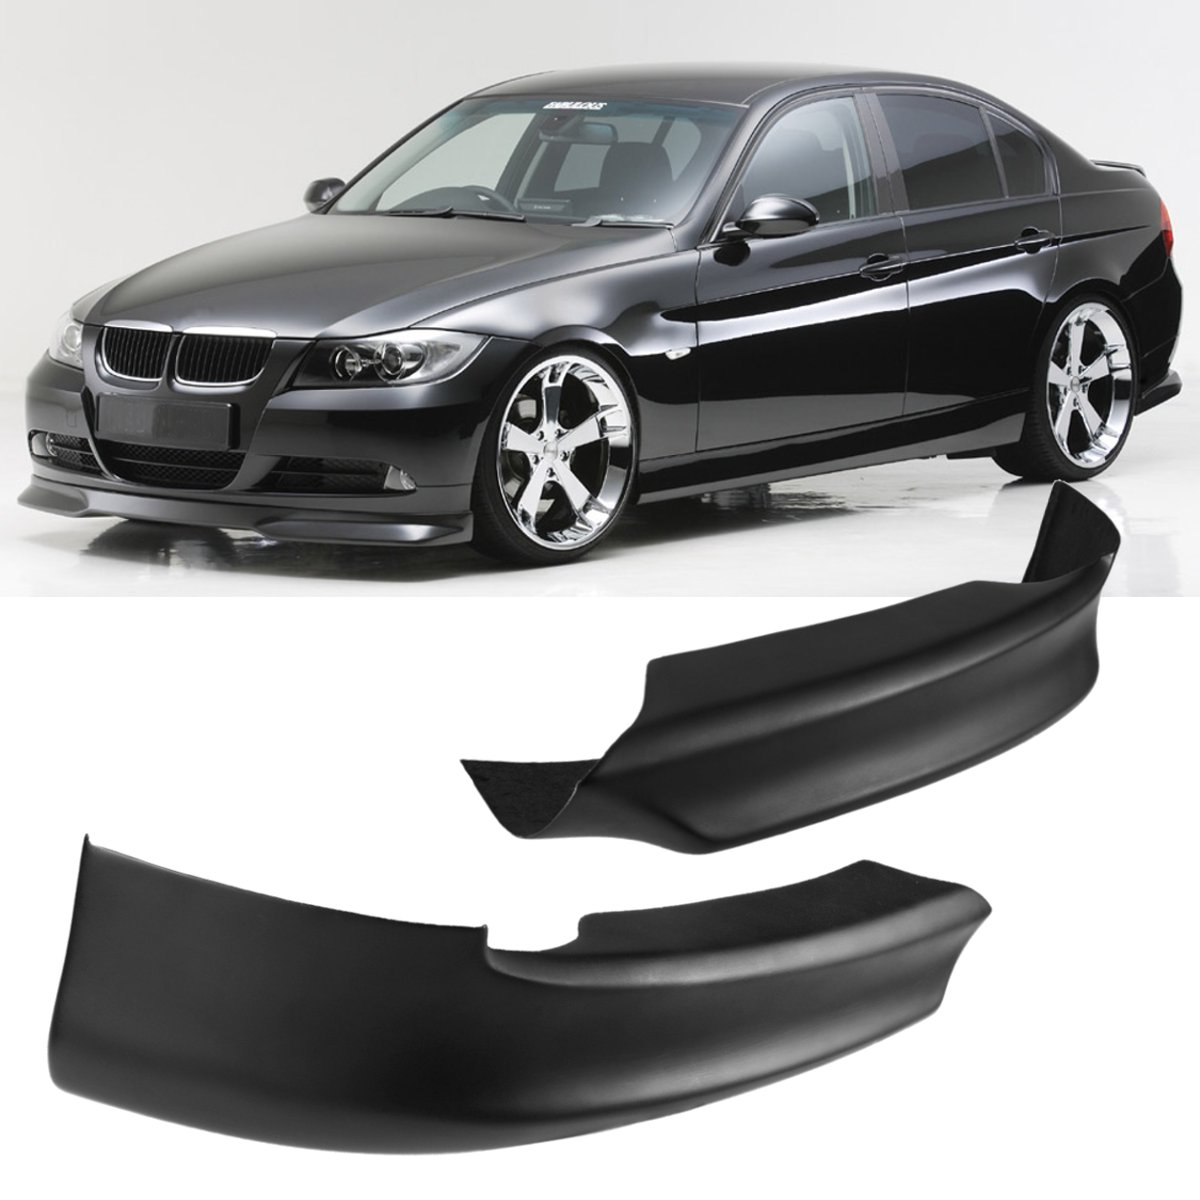 A Pair Front Bumper Lip Spoiler Splitter High quality For BMW E90 325i 335i 328i 330i 2005-2008